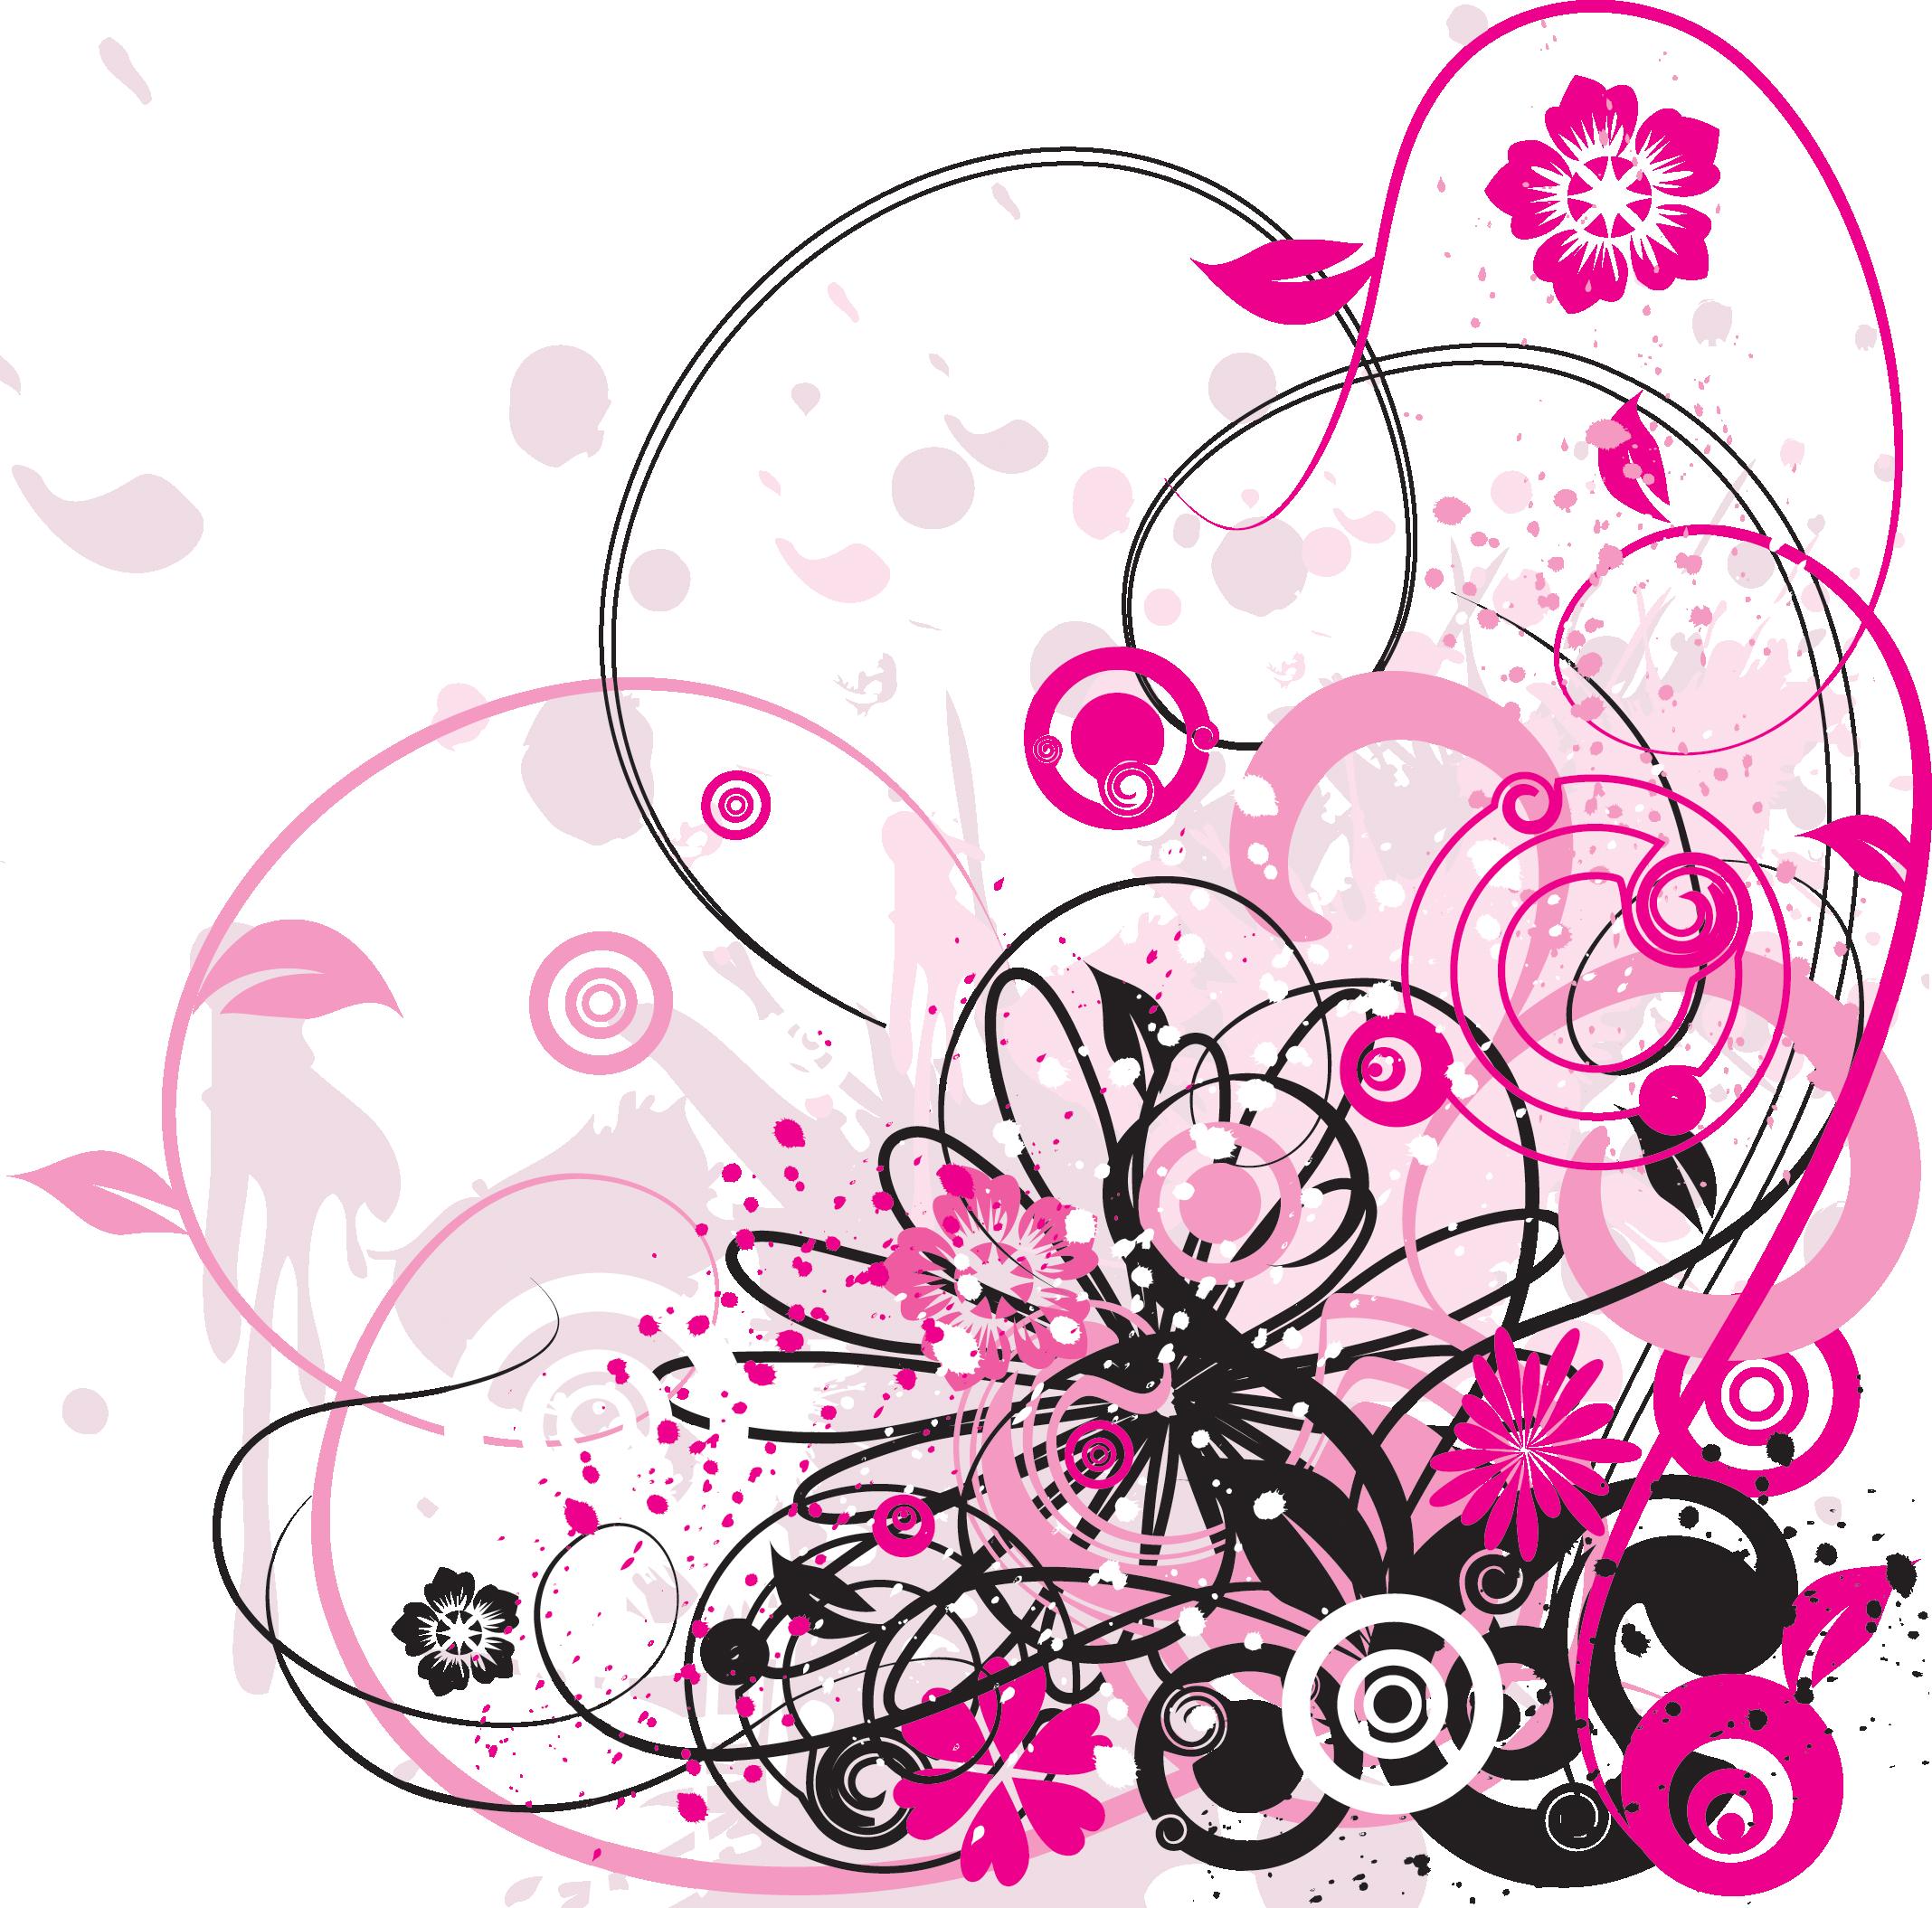 render autres inconnu renders cadre encadrement rose noir nature abstrait feuilles fleurs. Black Bedroom Furniture Sets. Home Design Ideas